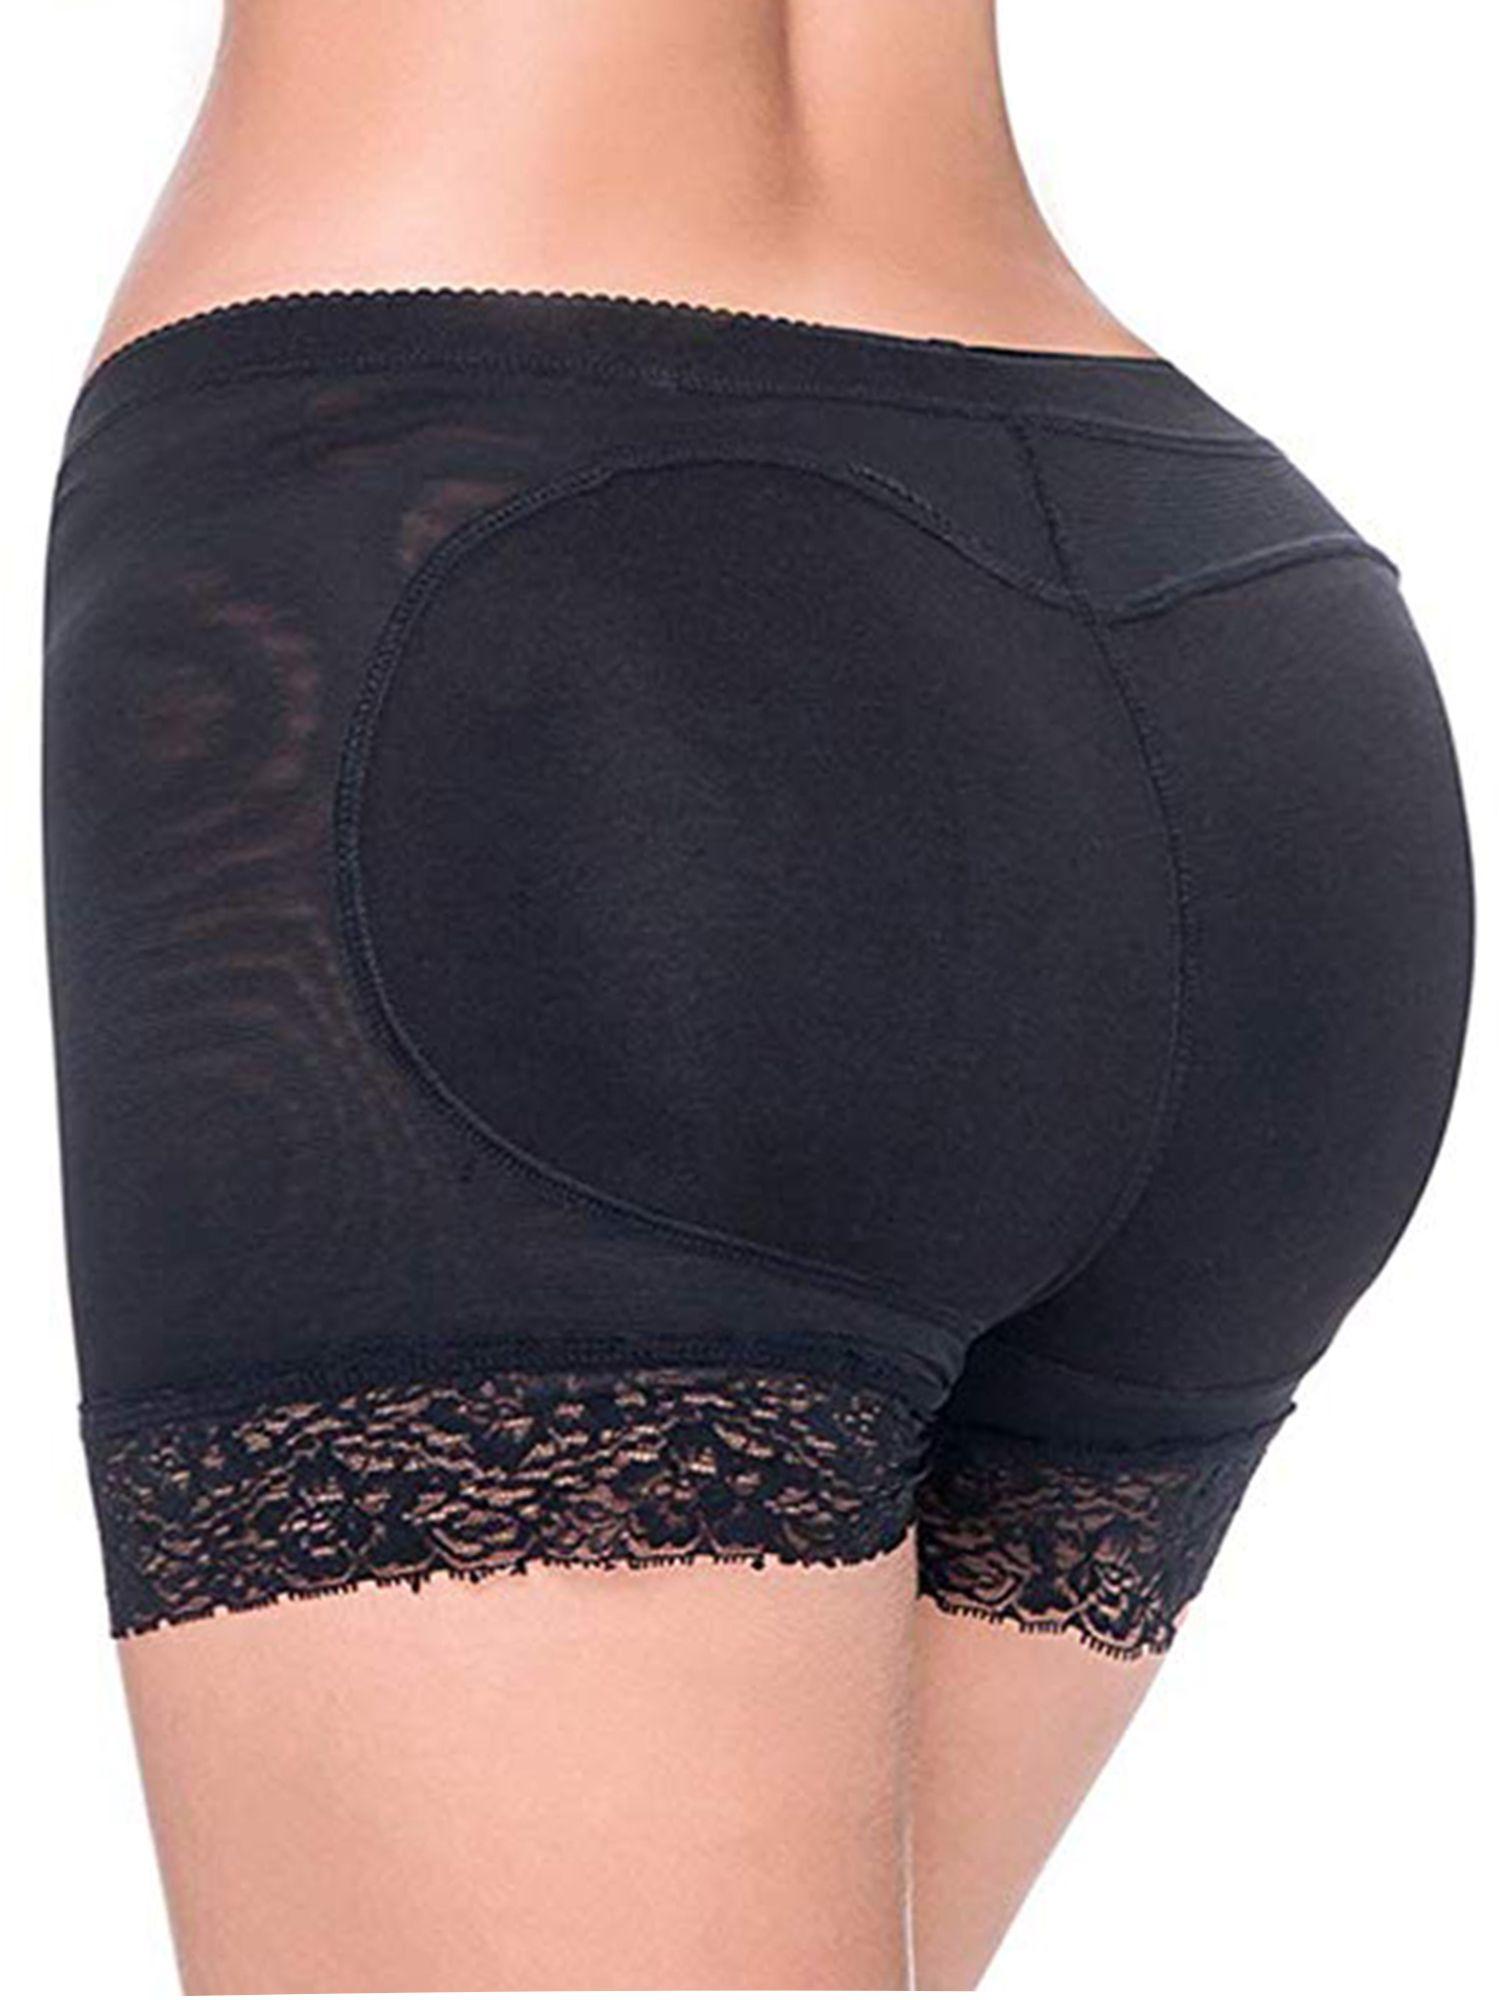 b5840c866673 SAYFUT Womens Seamless Butt Lifter Panties Padded Removable Butt Pad Lace  Panties Enhancer Underwear Shapewear #